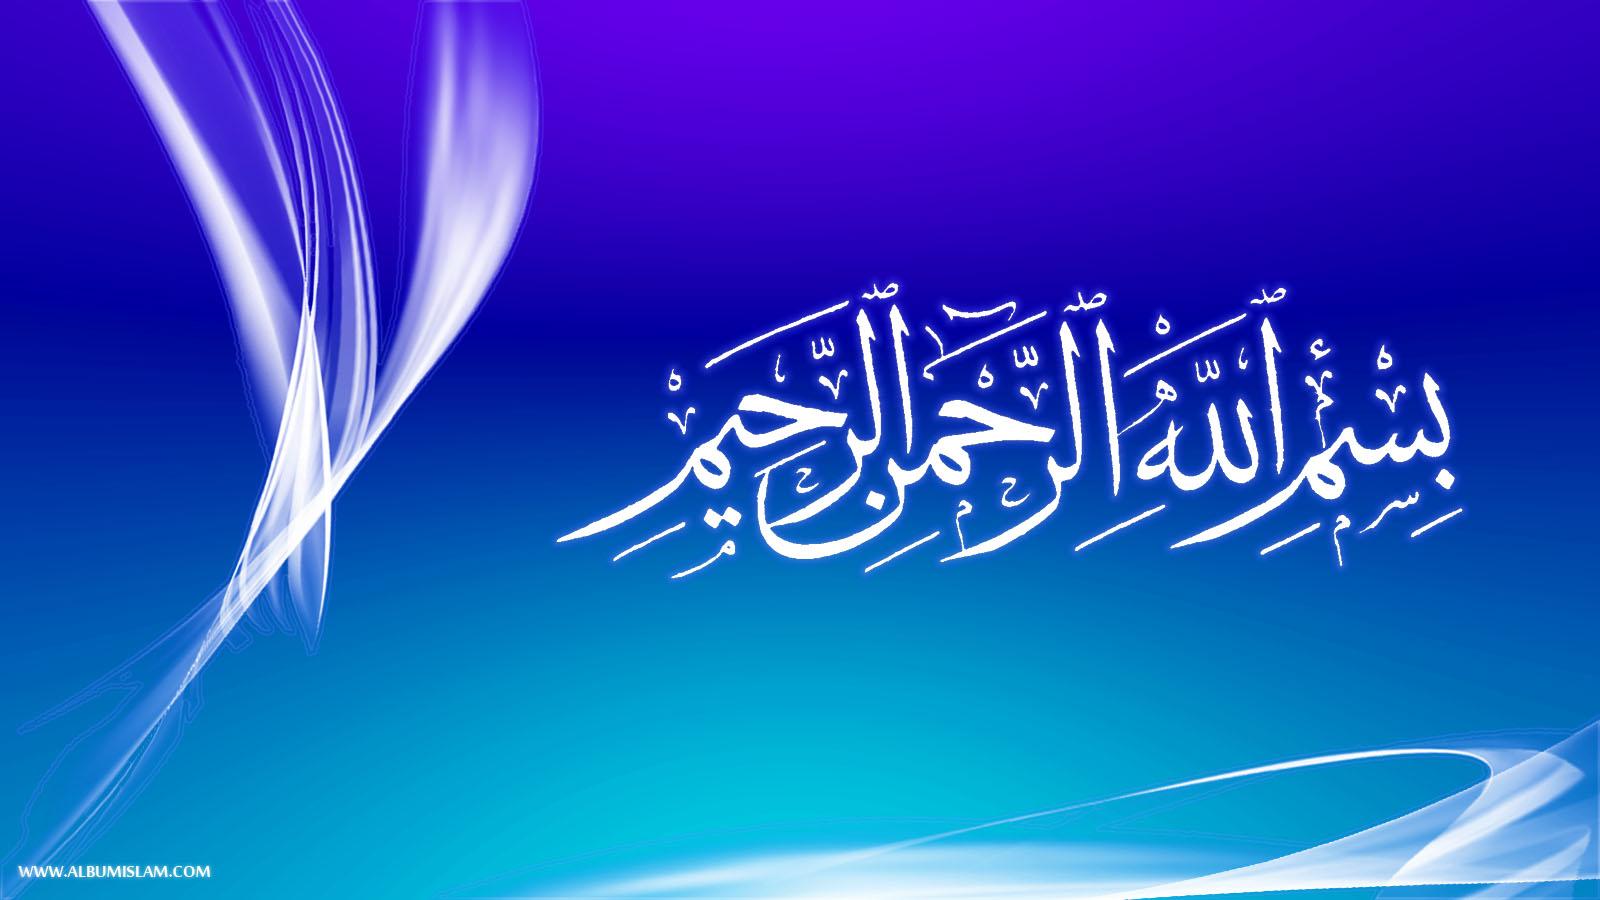 islamic wallpaper with basmala - photo #17